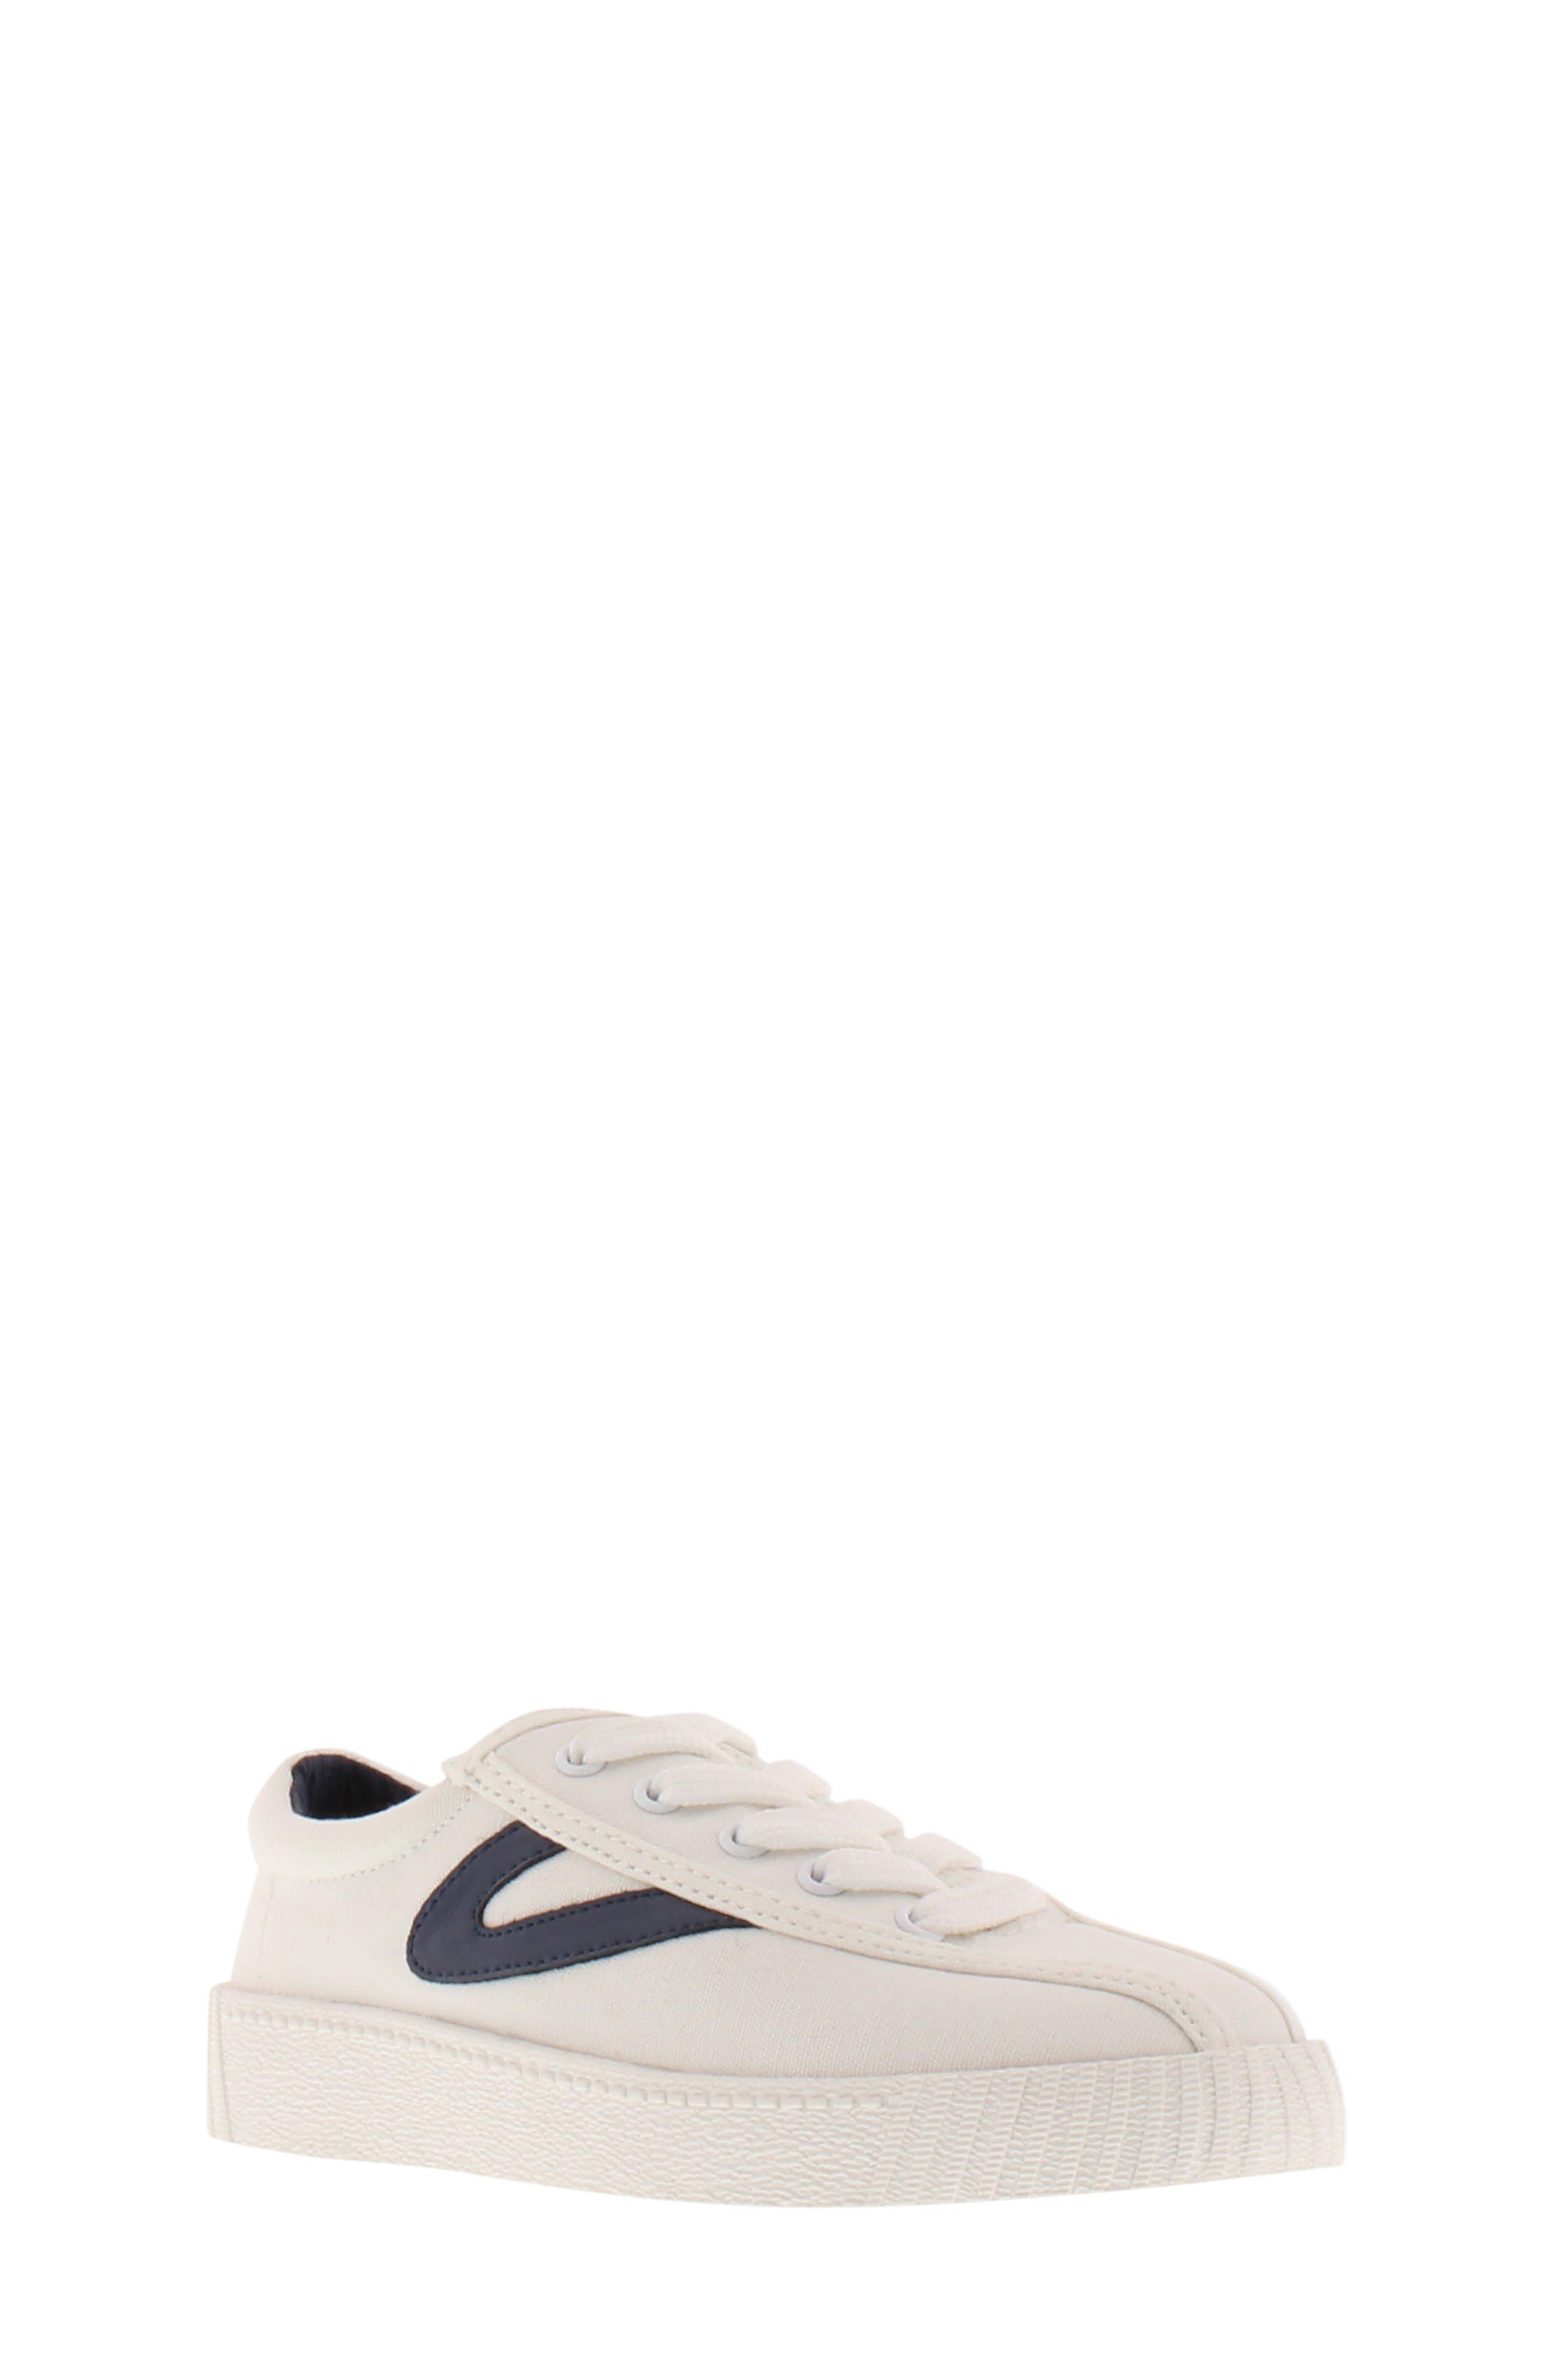 Nylite Plus Sneaker,                             Main thumbnail 1, color,                             WHITE/ NIGHT